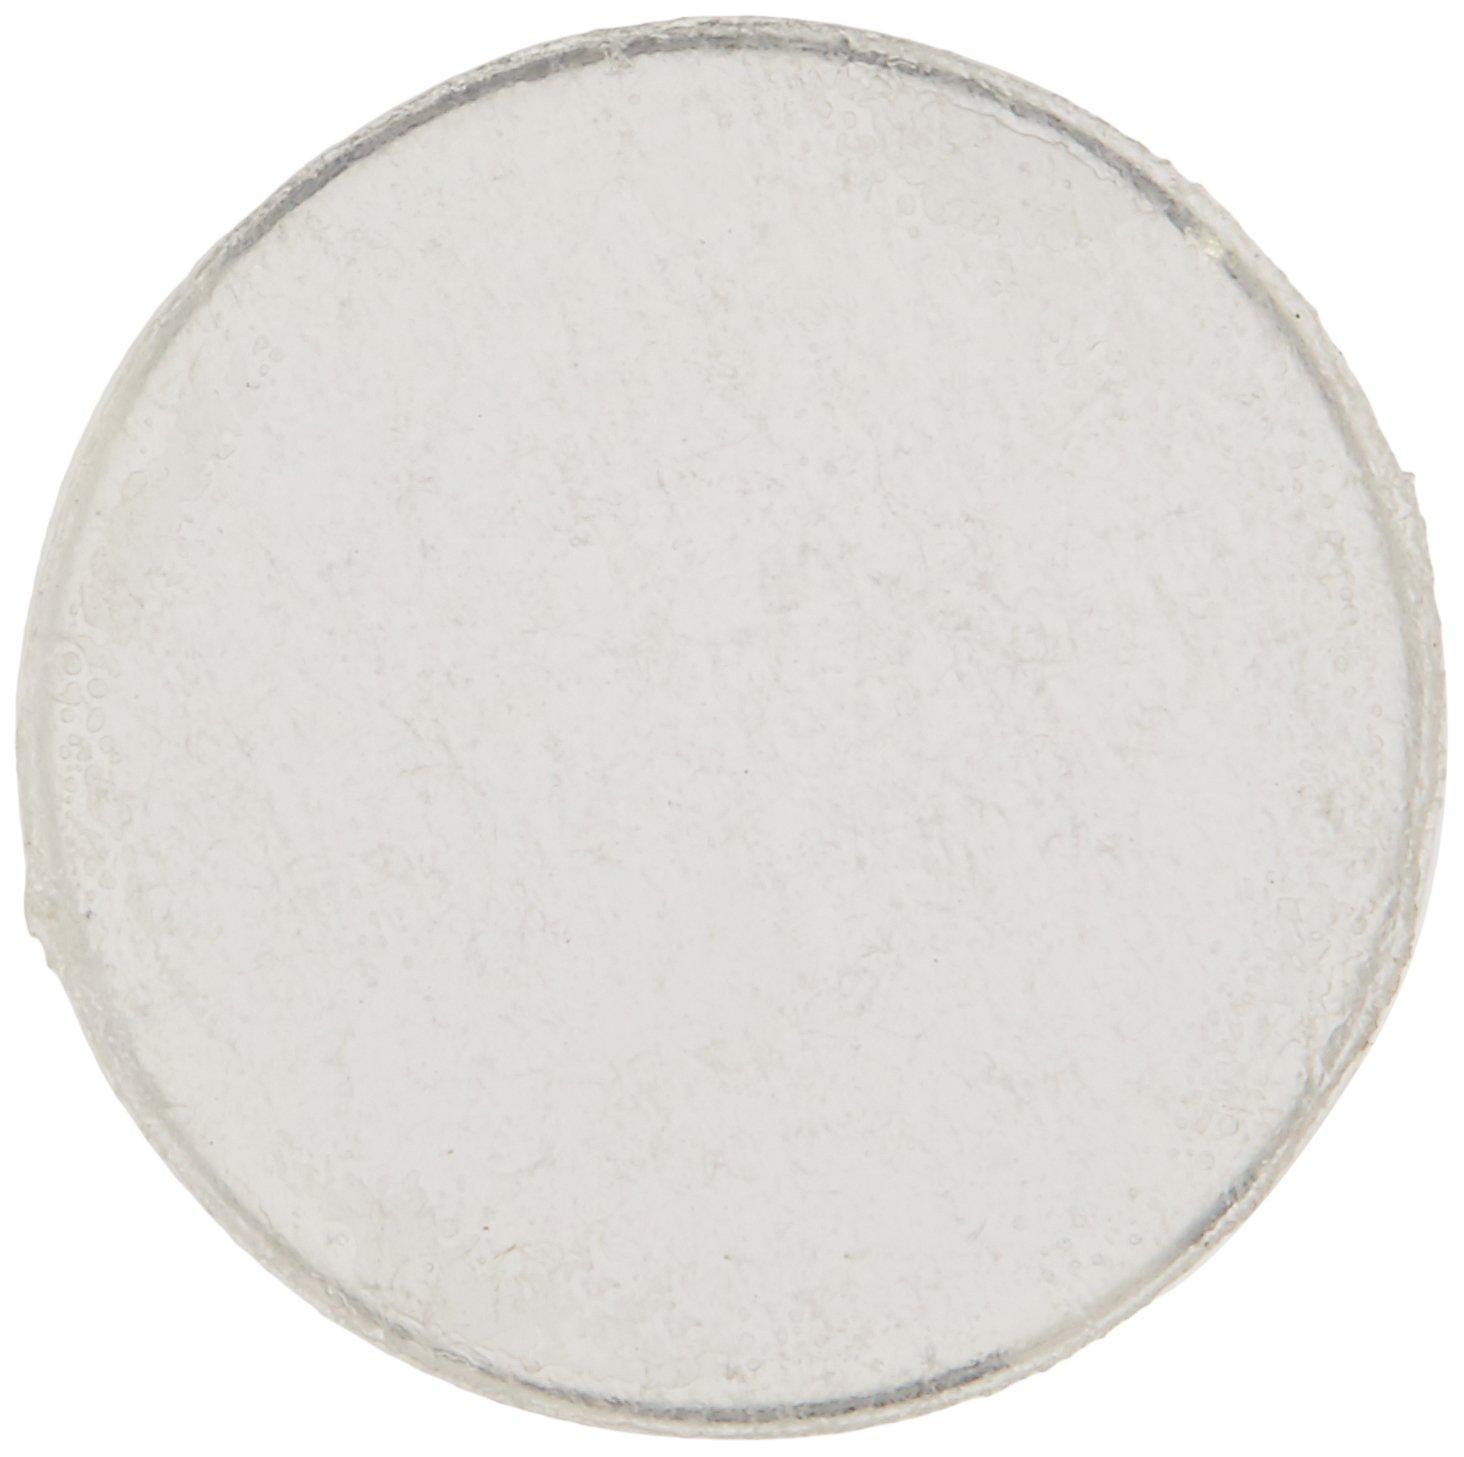 Shepherd Hardware 9965 3//4-Inch SurfaceGard Self-Adhesive Round Transparent Bumper Pads 8-Count